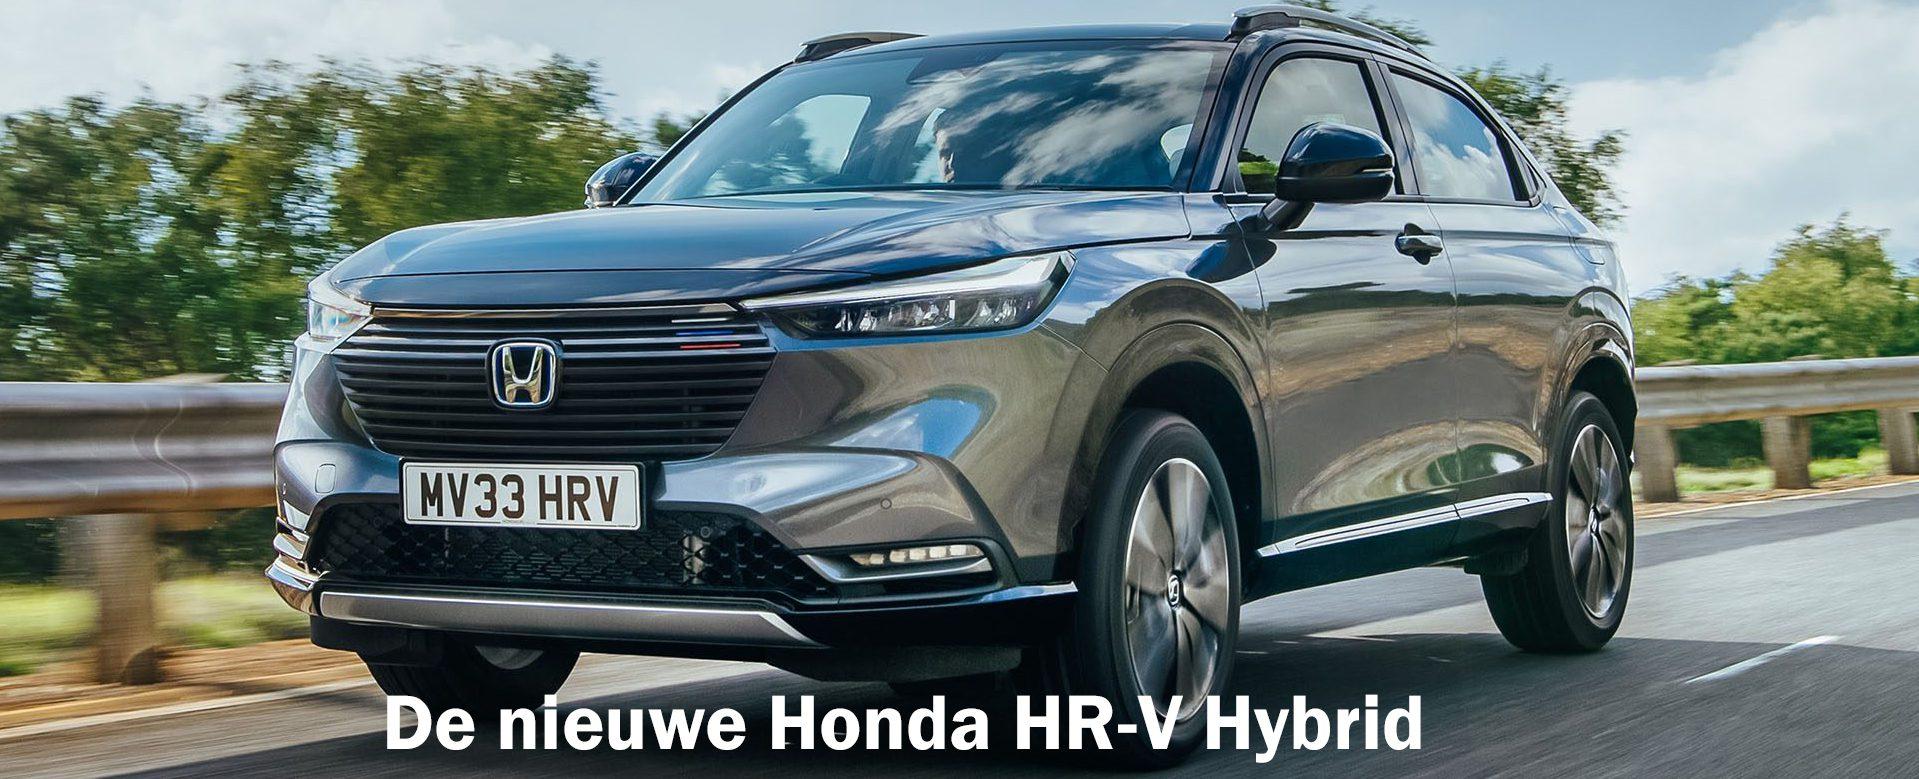 Introductie video nieuwe Honda HR-V hybrid